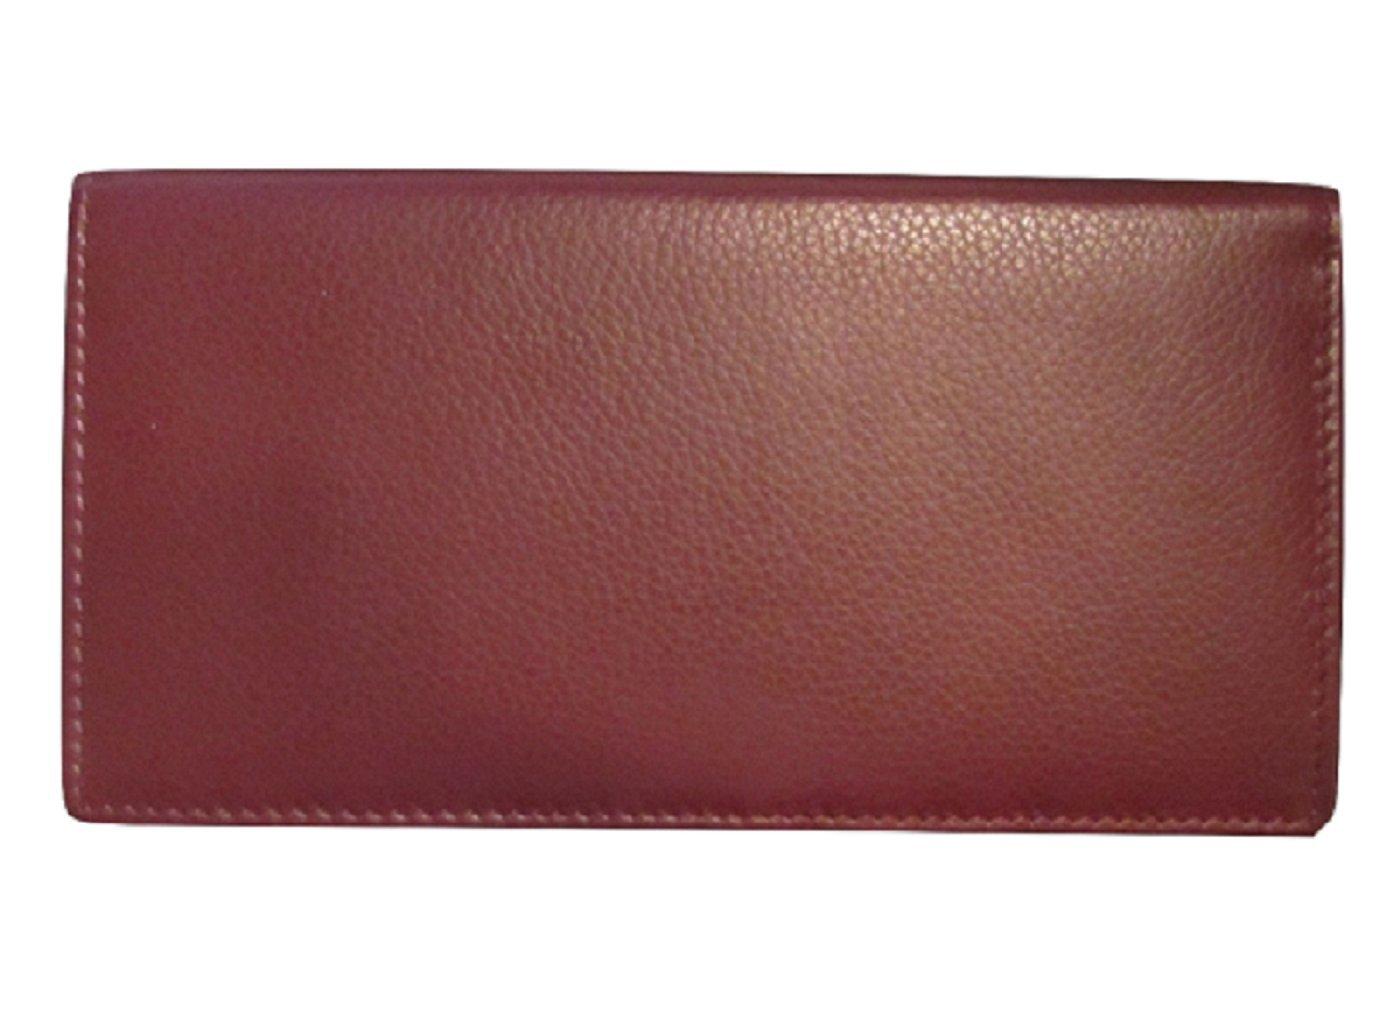 ili 7406 RFB Leather Checkbook with Pen Holder (Fine Wine)